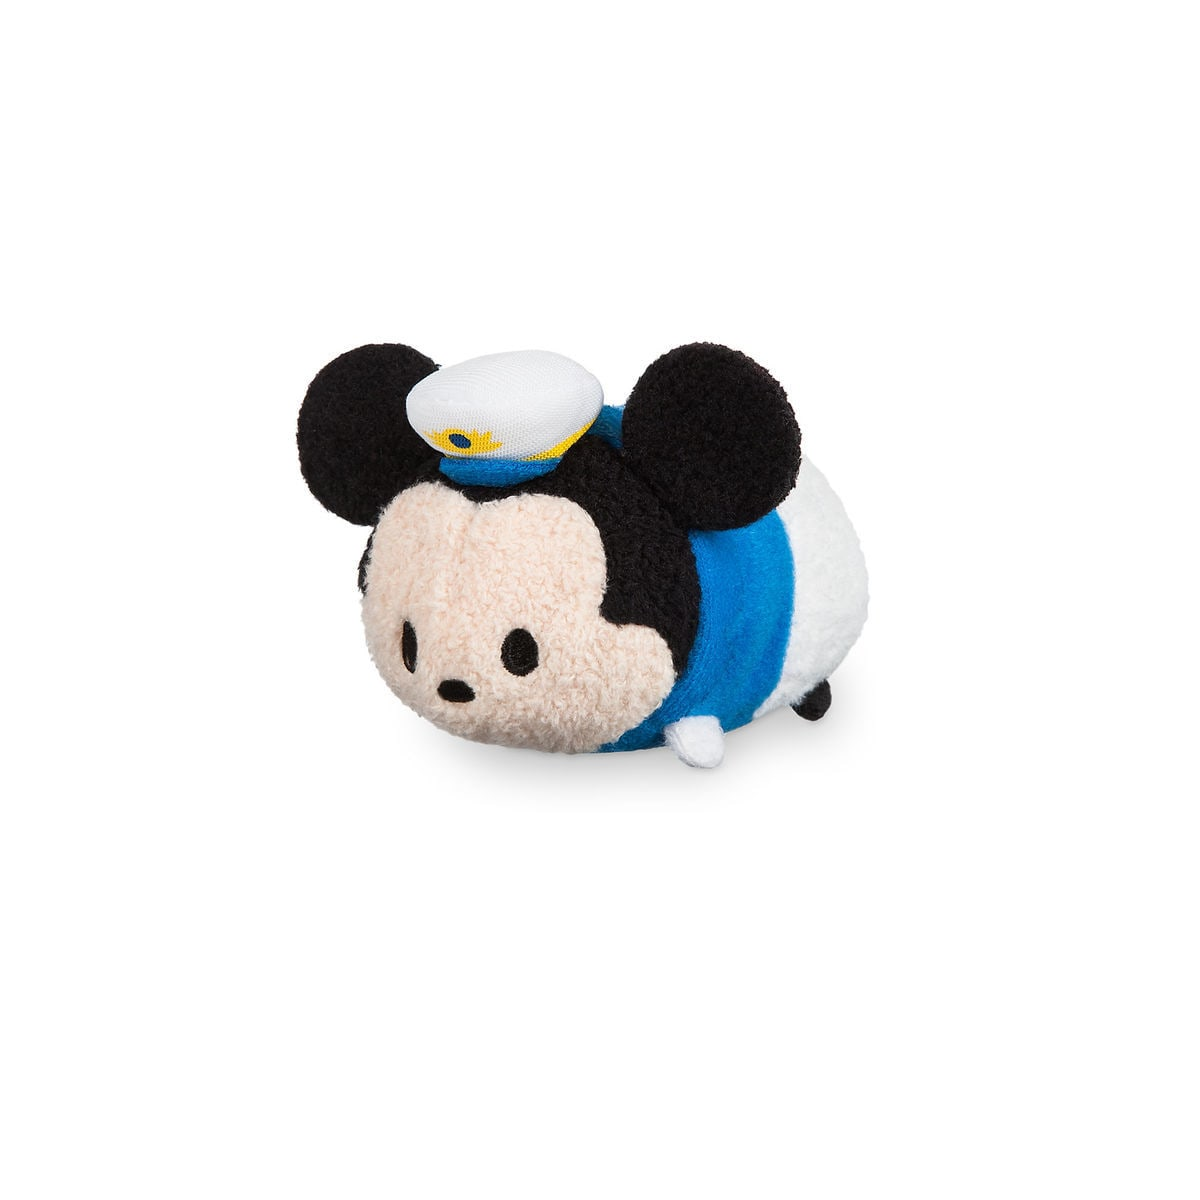 f3b1527ffa62 Mickey Mouse   Tsum Tsum   Plush - Disney Cruise Line - Mini - 3 1 2 ...